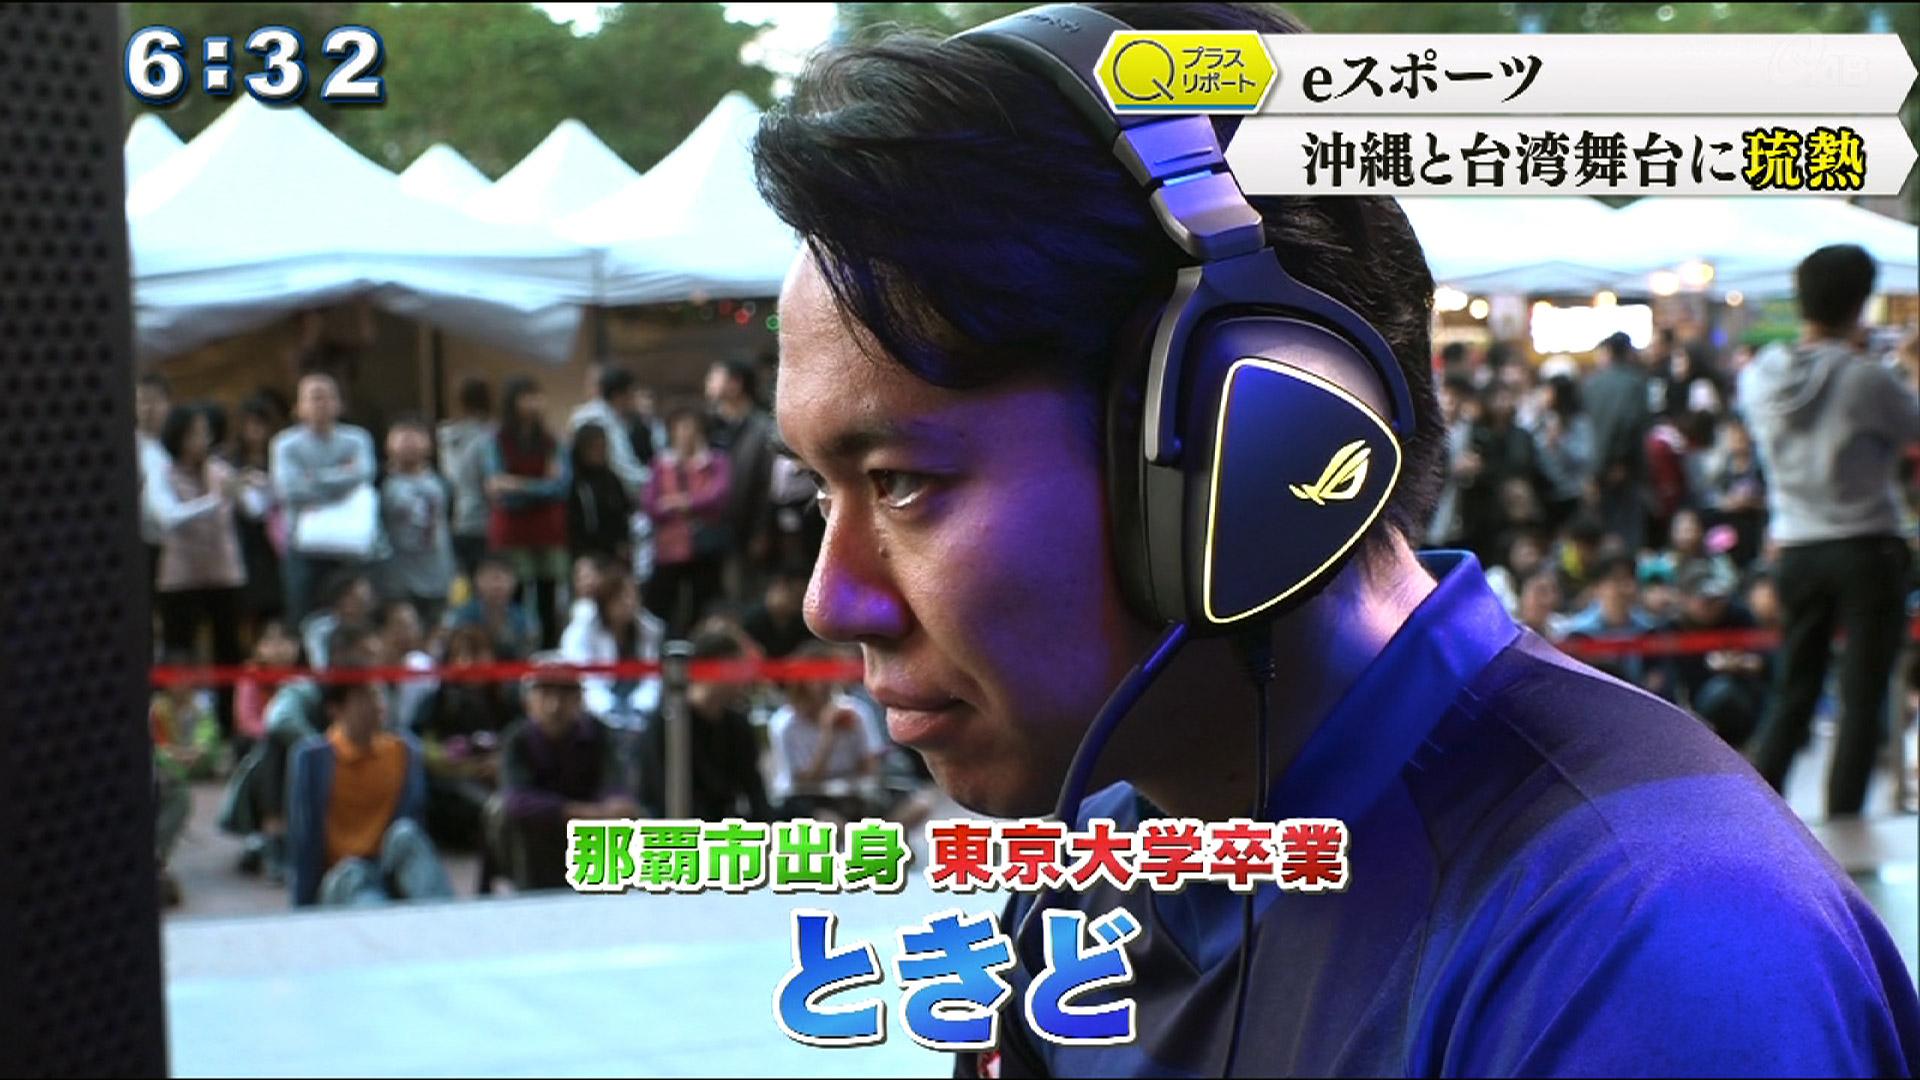 Qプラスリポート eスポーツでつながる沖縄と台湾